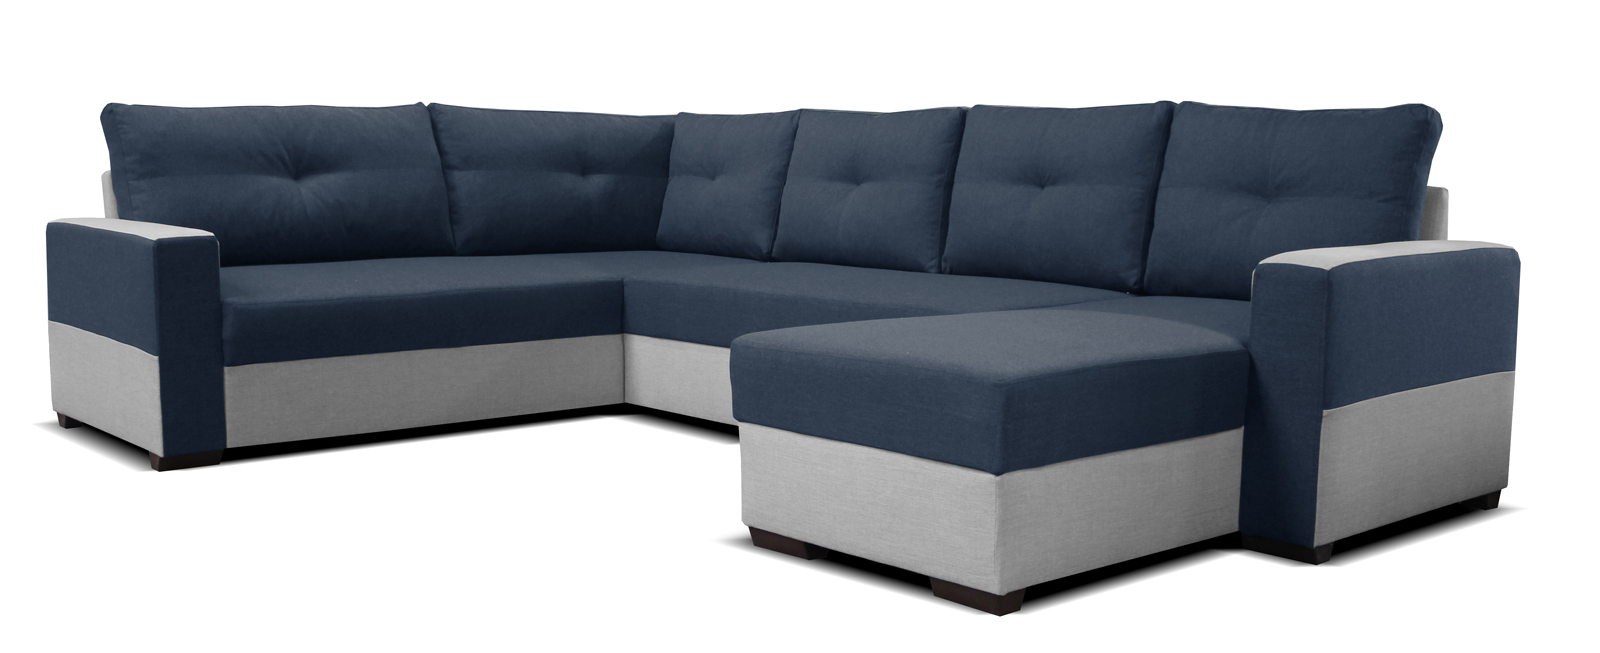 Rohová sedací souprava U - Po-Sed - Arenna BL+2+L (s taburetem) (modrá + šedá) (P)